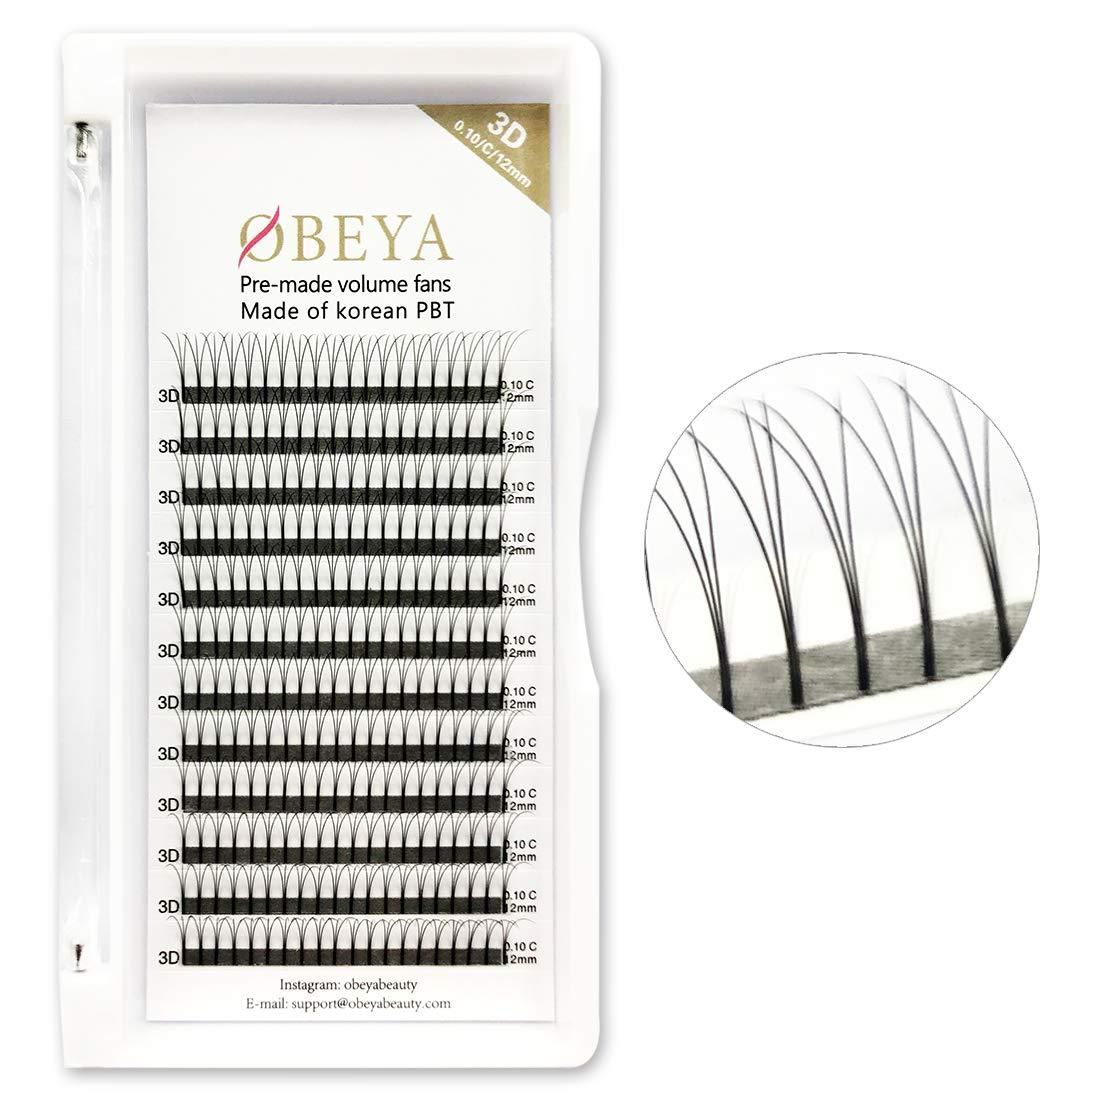 Premade Fans 3D Lash Extensions .10 C Curl Long Stem Volume Lashes 12mm Russian Volume Eyelash Extensions (12mm)